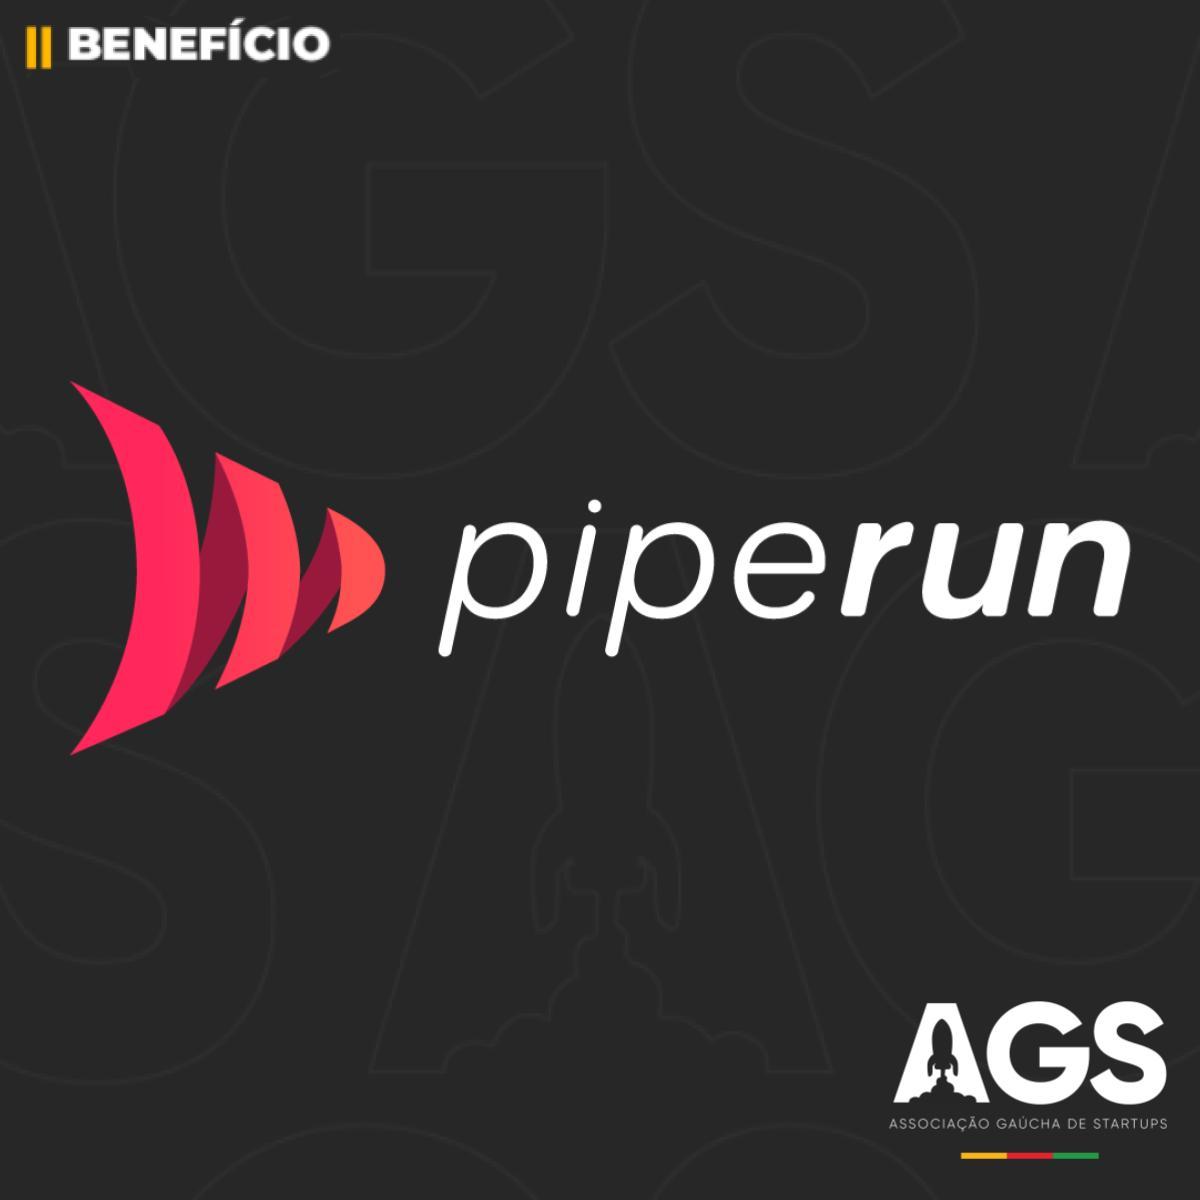 Piperun - post benefício